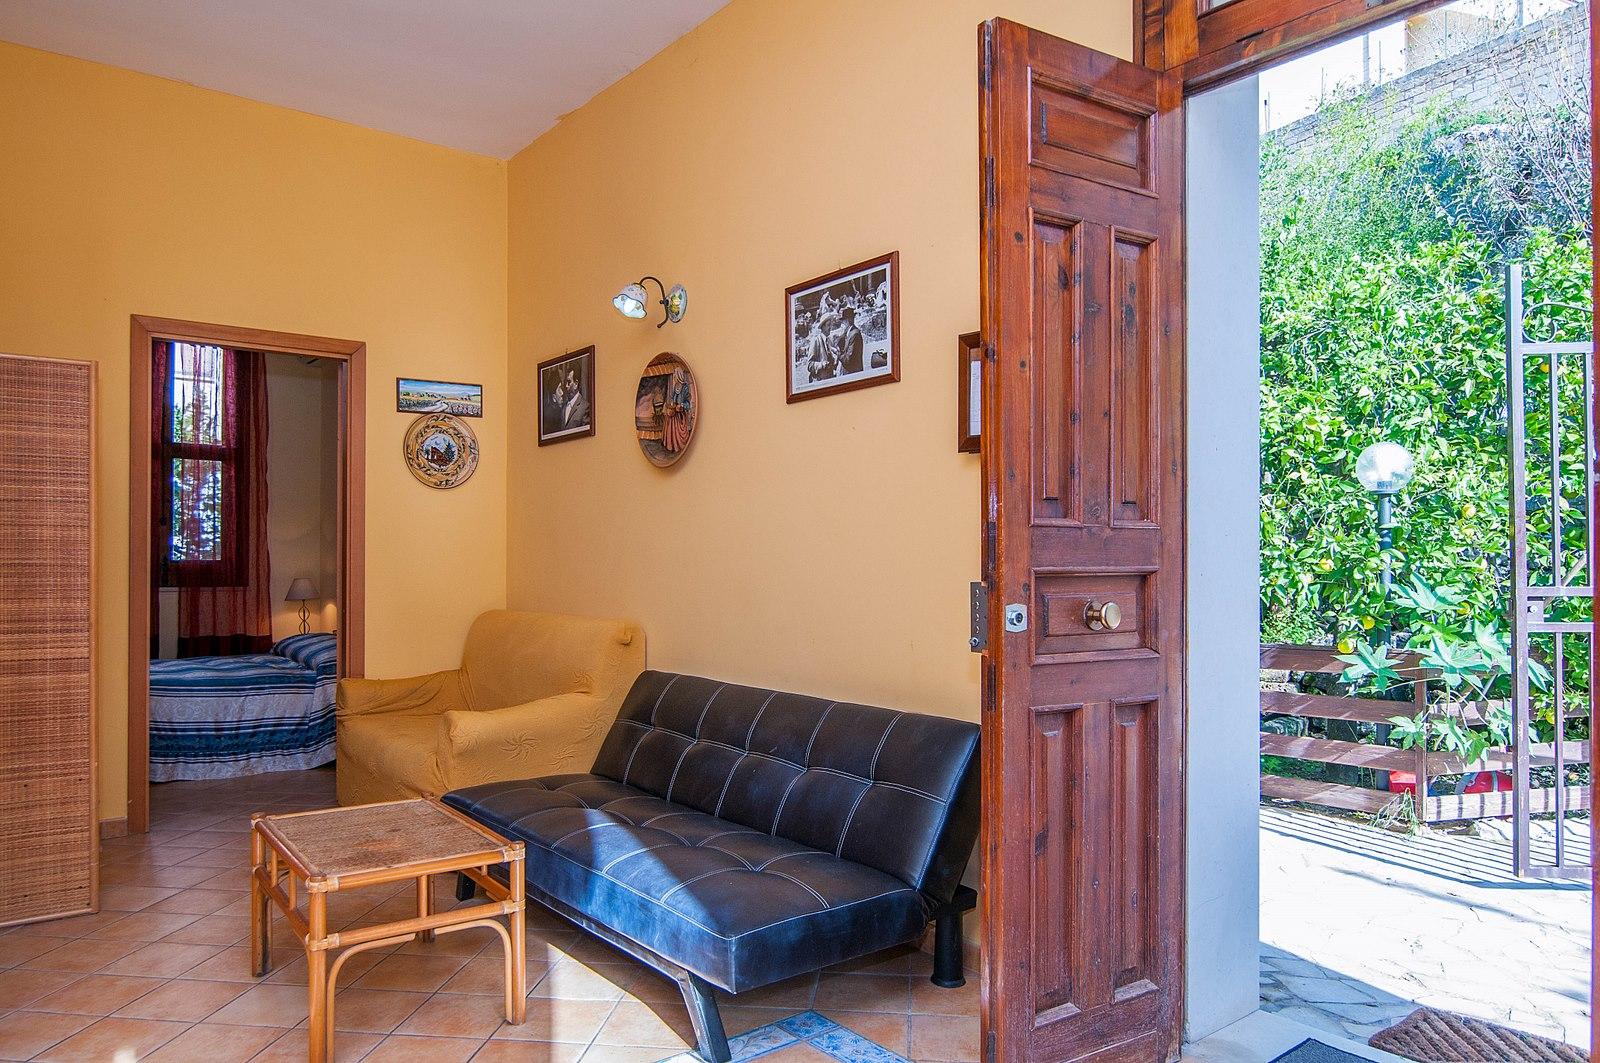 Maison de vacances Villetta a Lido (1540086), Lido di Noto, Siracusa, Sicile, Italie, image 17